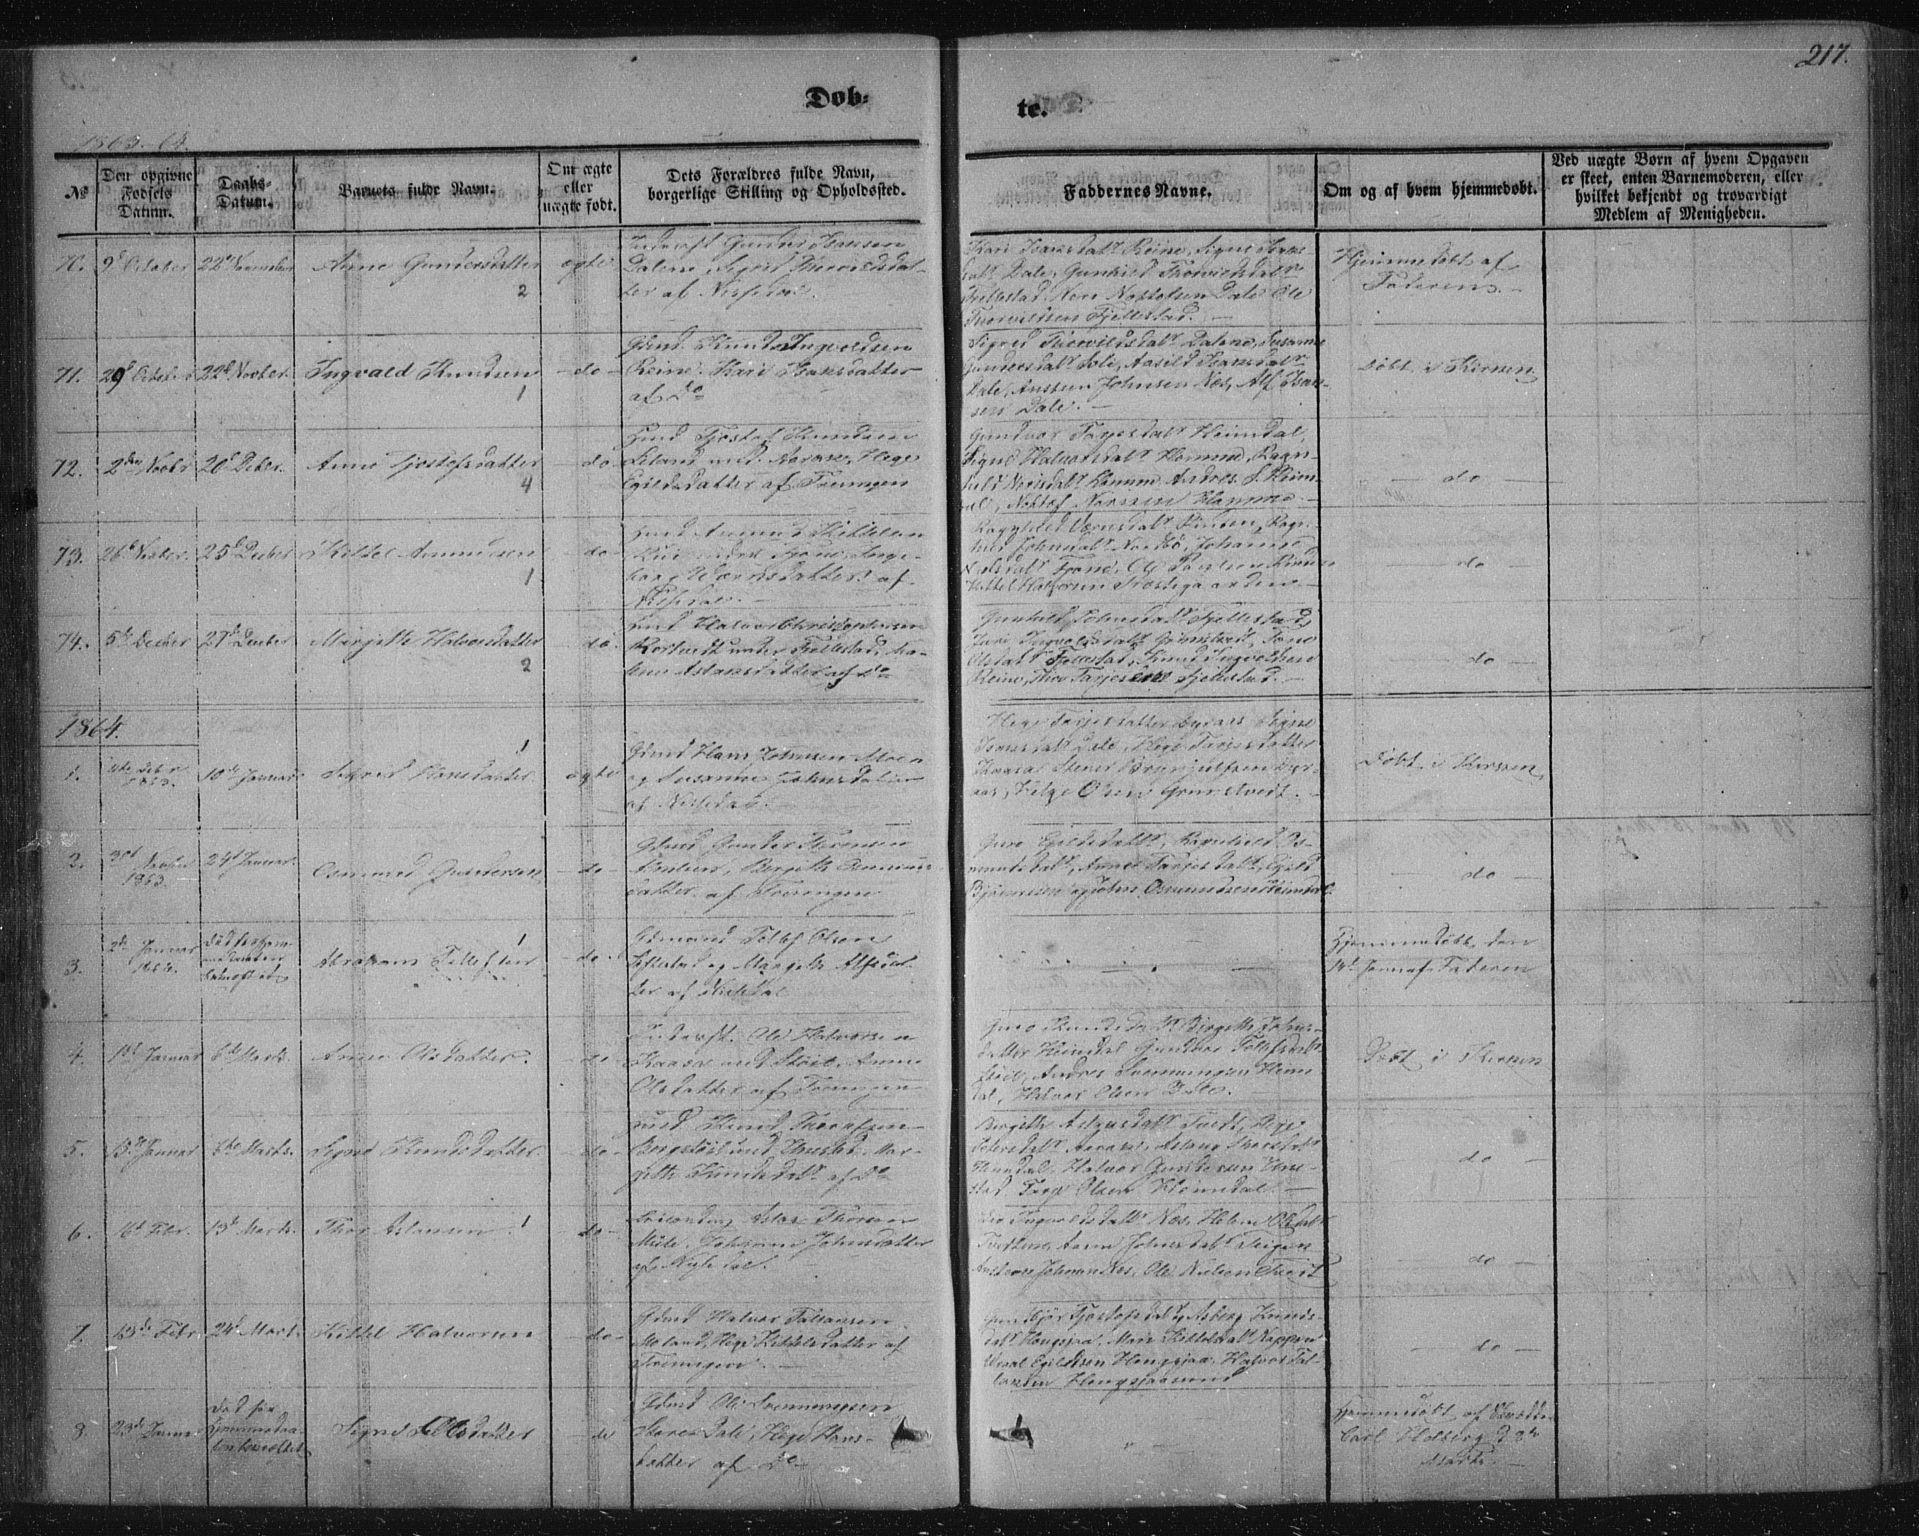 SAKO, Nissedal kirkebøker, F/Fa/L0003: Ministerialbok nr. I 3, 1846-1870, s. 216-217